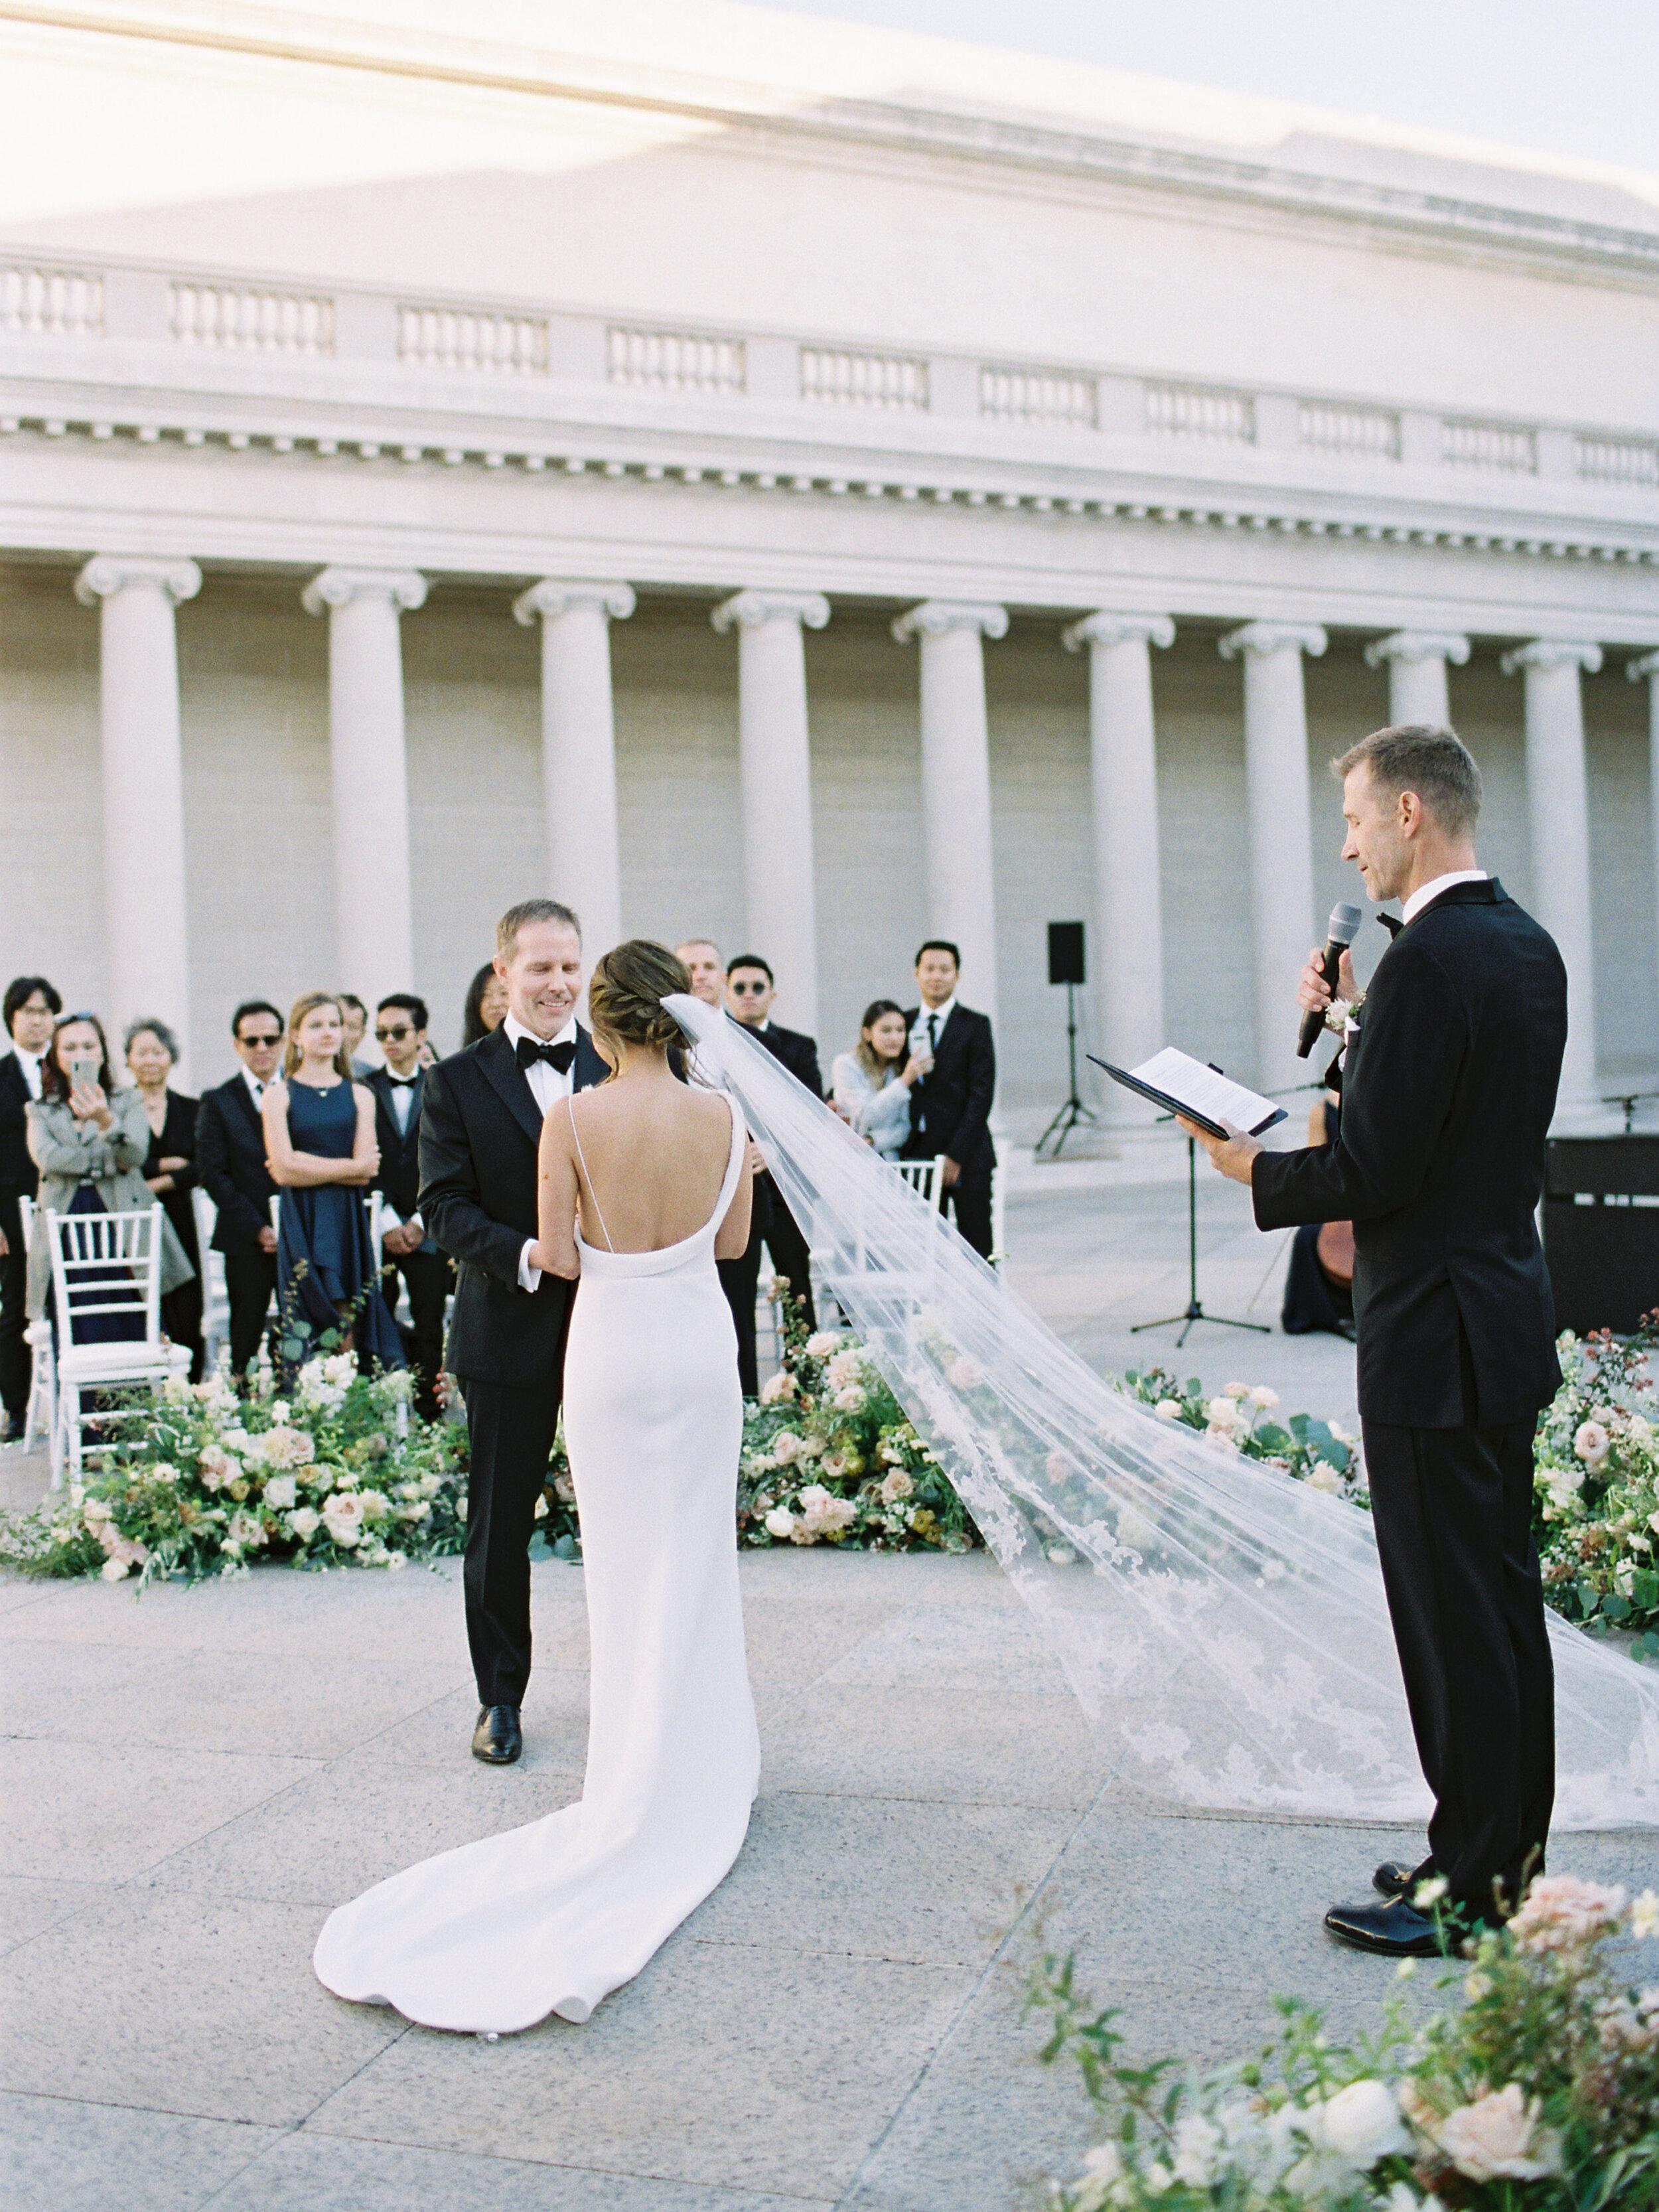 Legion-of-Honor-Wedding-Jen-Huang-63.jpg